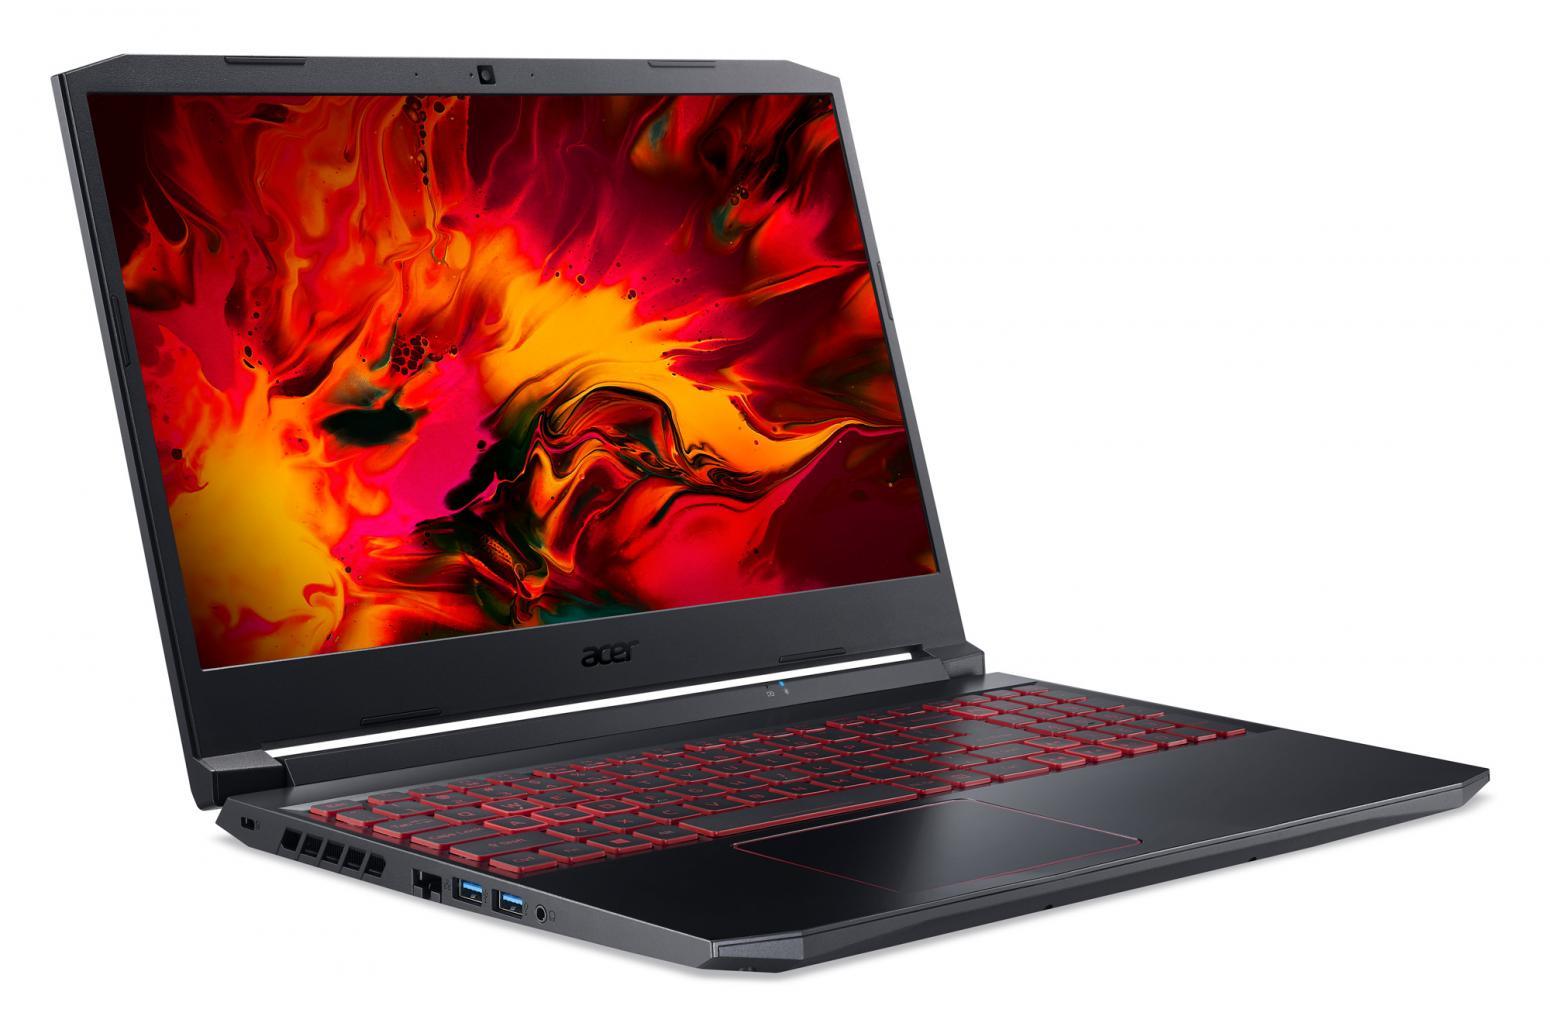 Image du PC portable Acer Nitro 5 AN515-55-5041 - RTX 3060, 144Hz